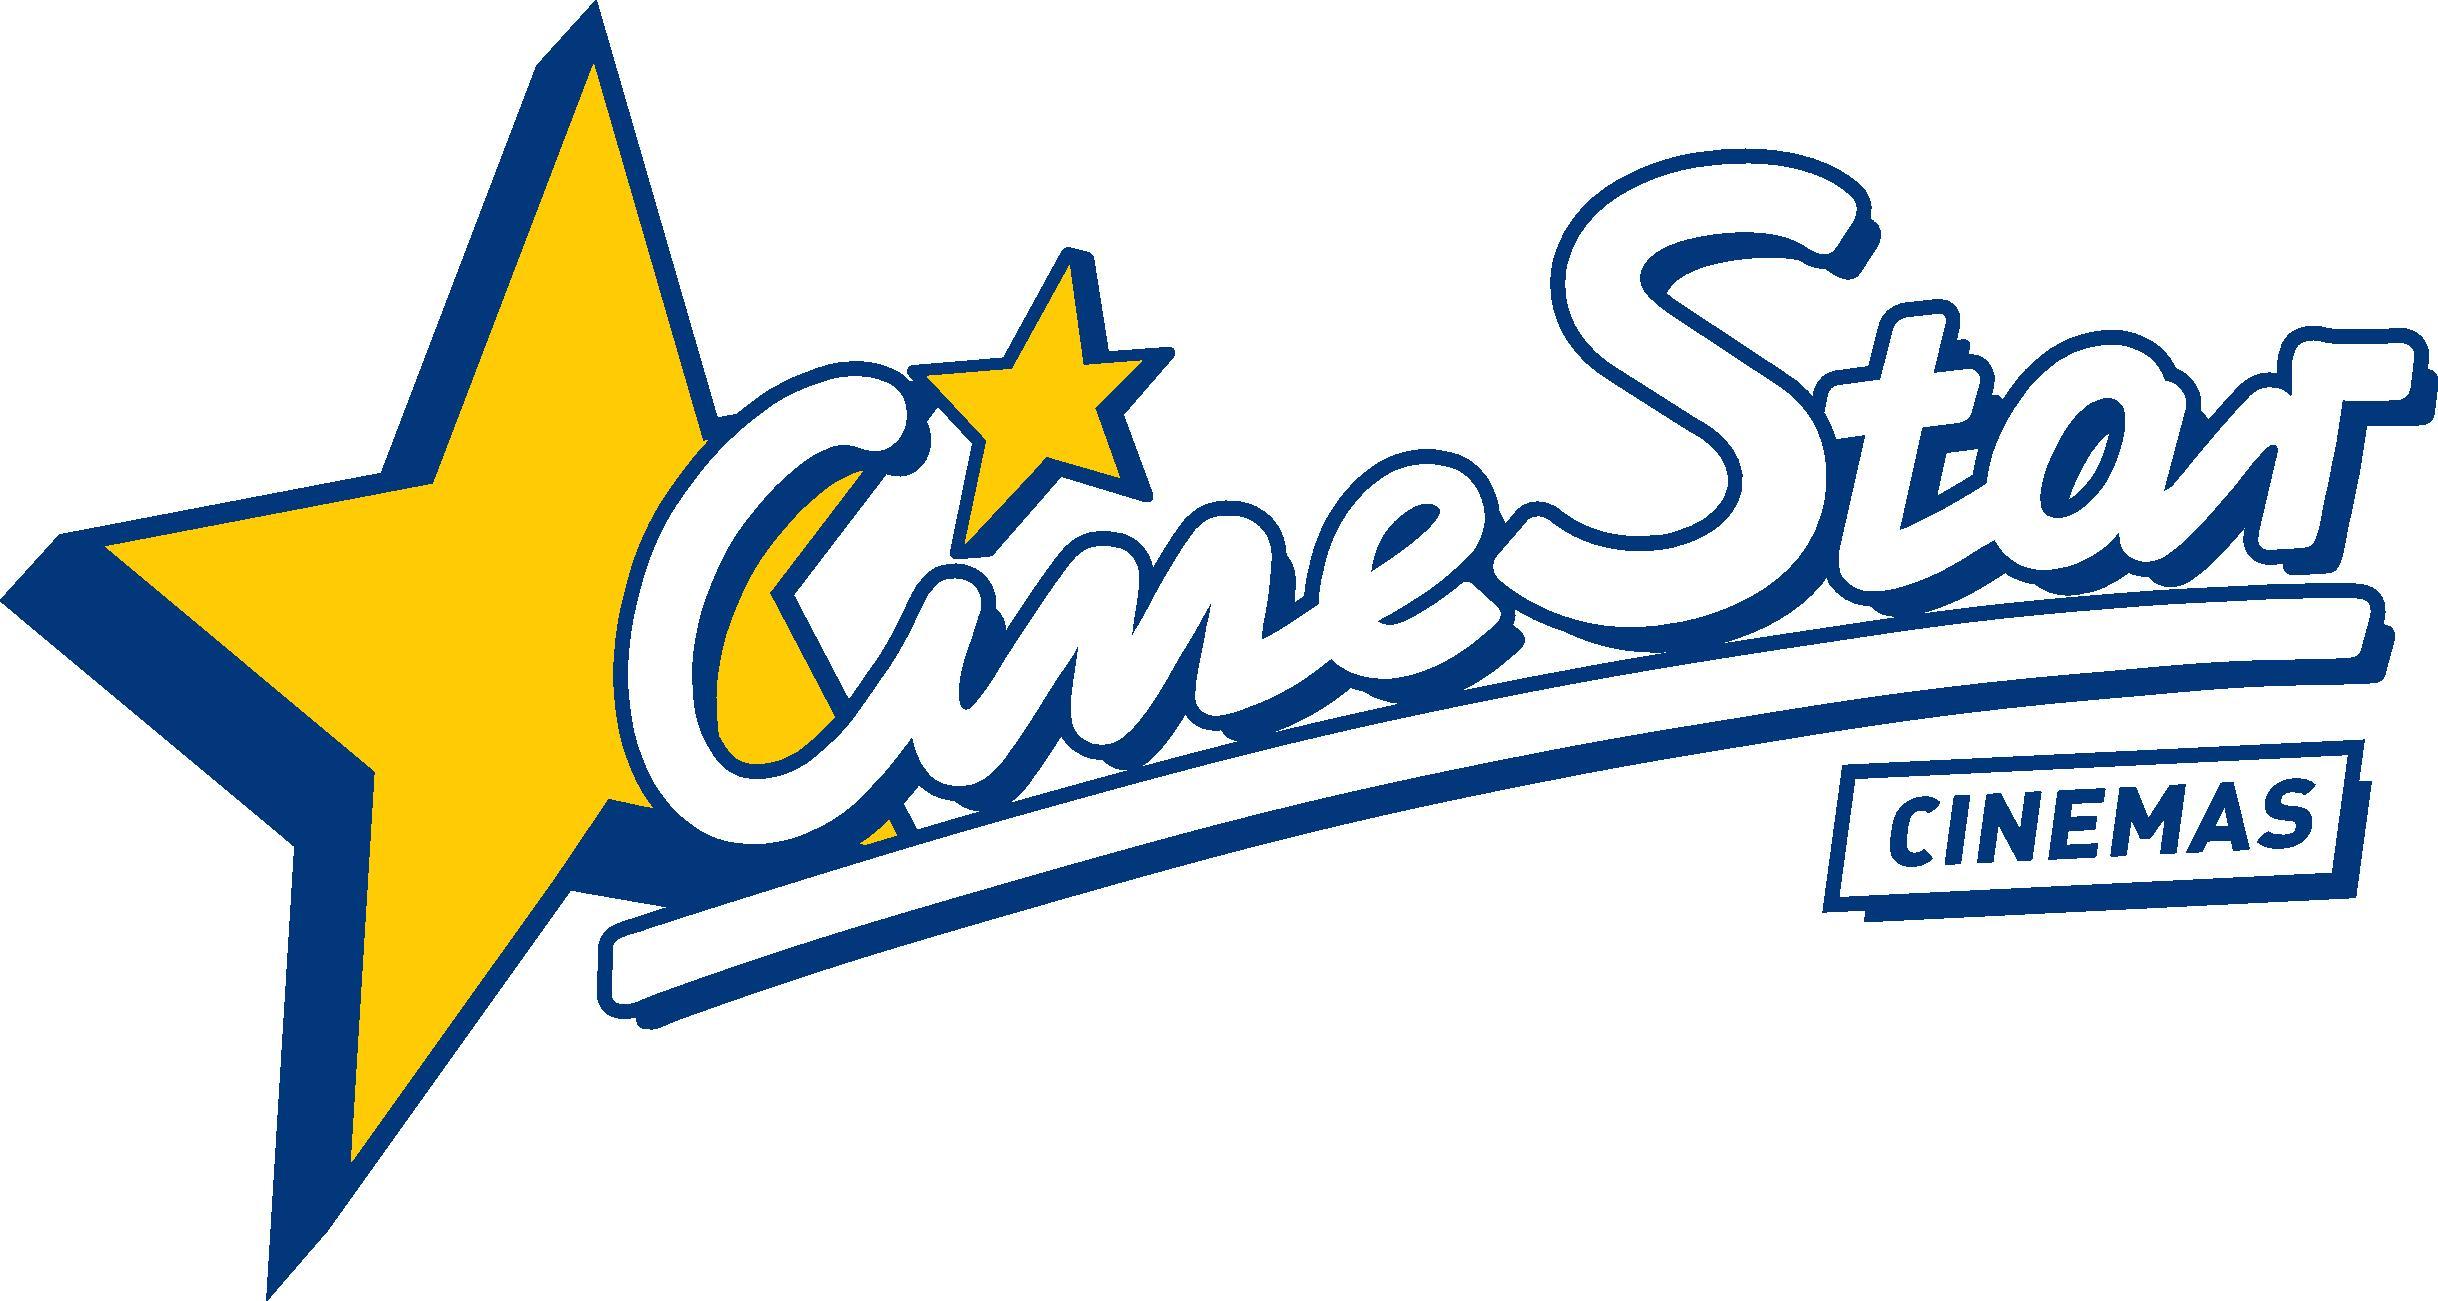 Cinestar Kino Store In Colosseum Supernova